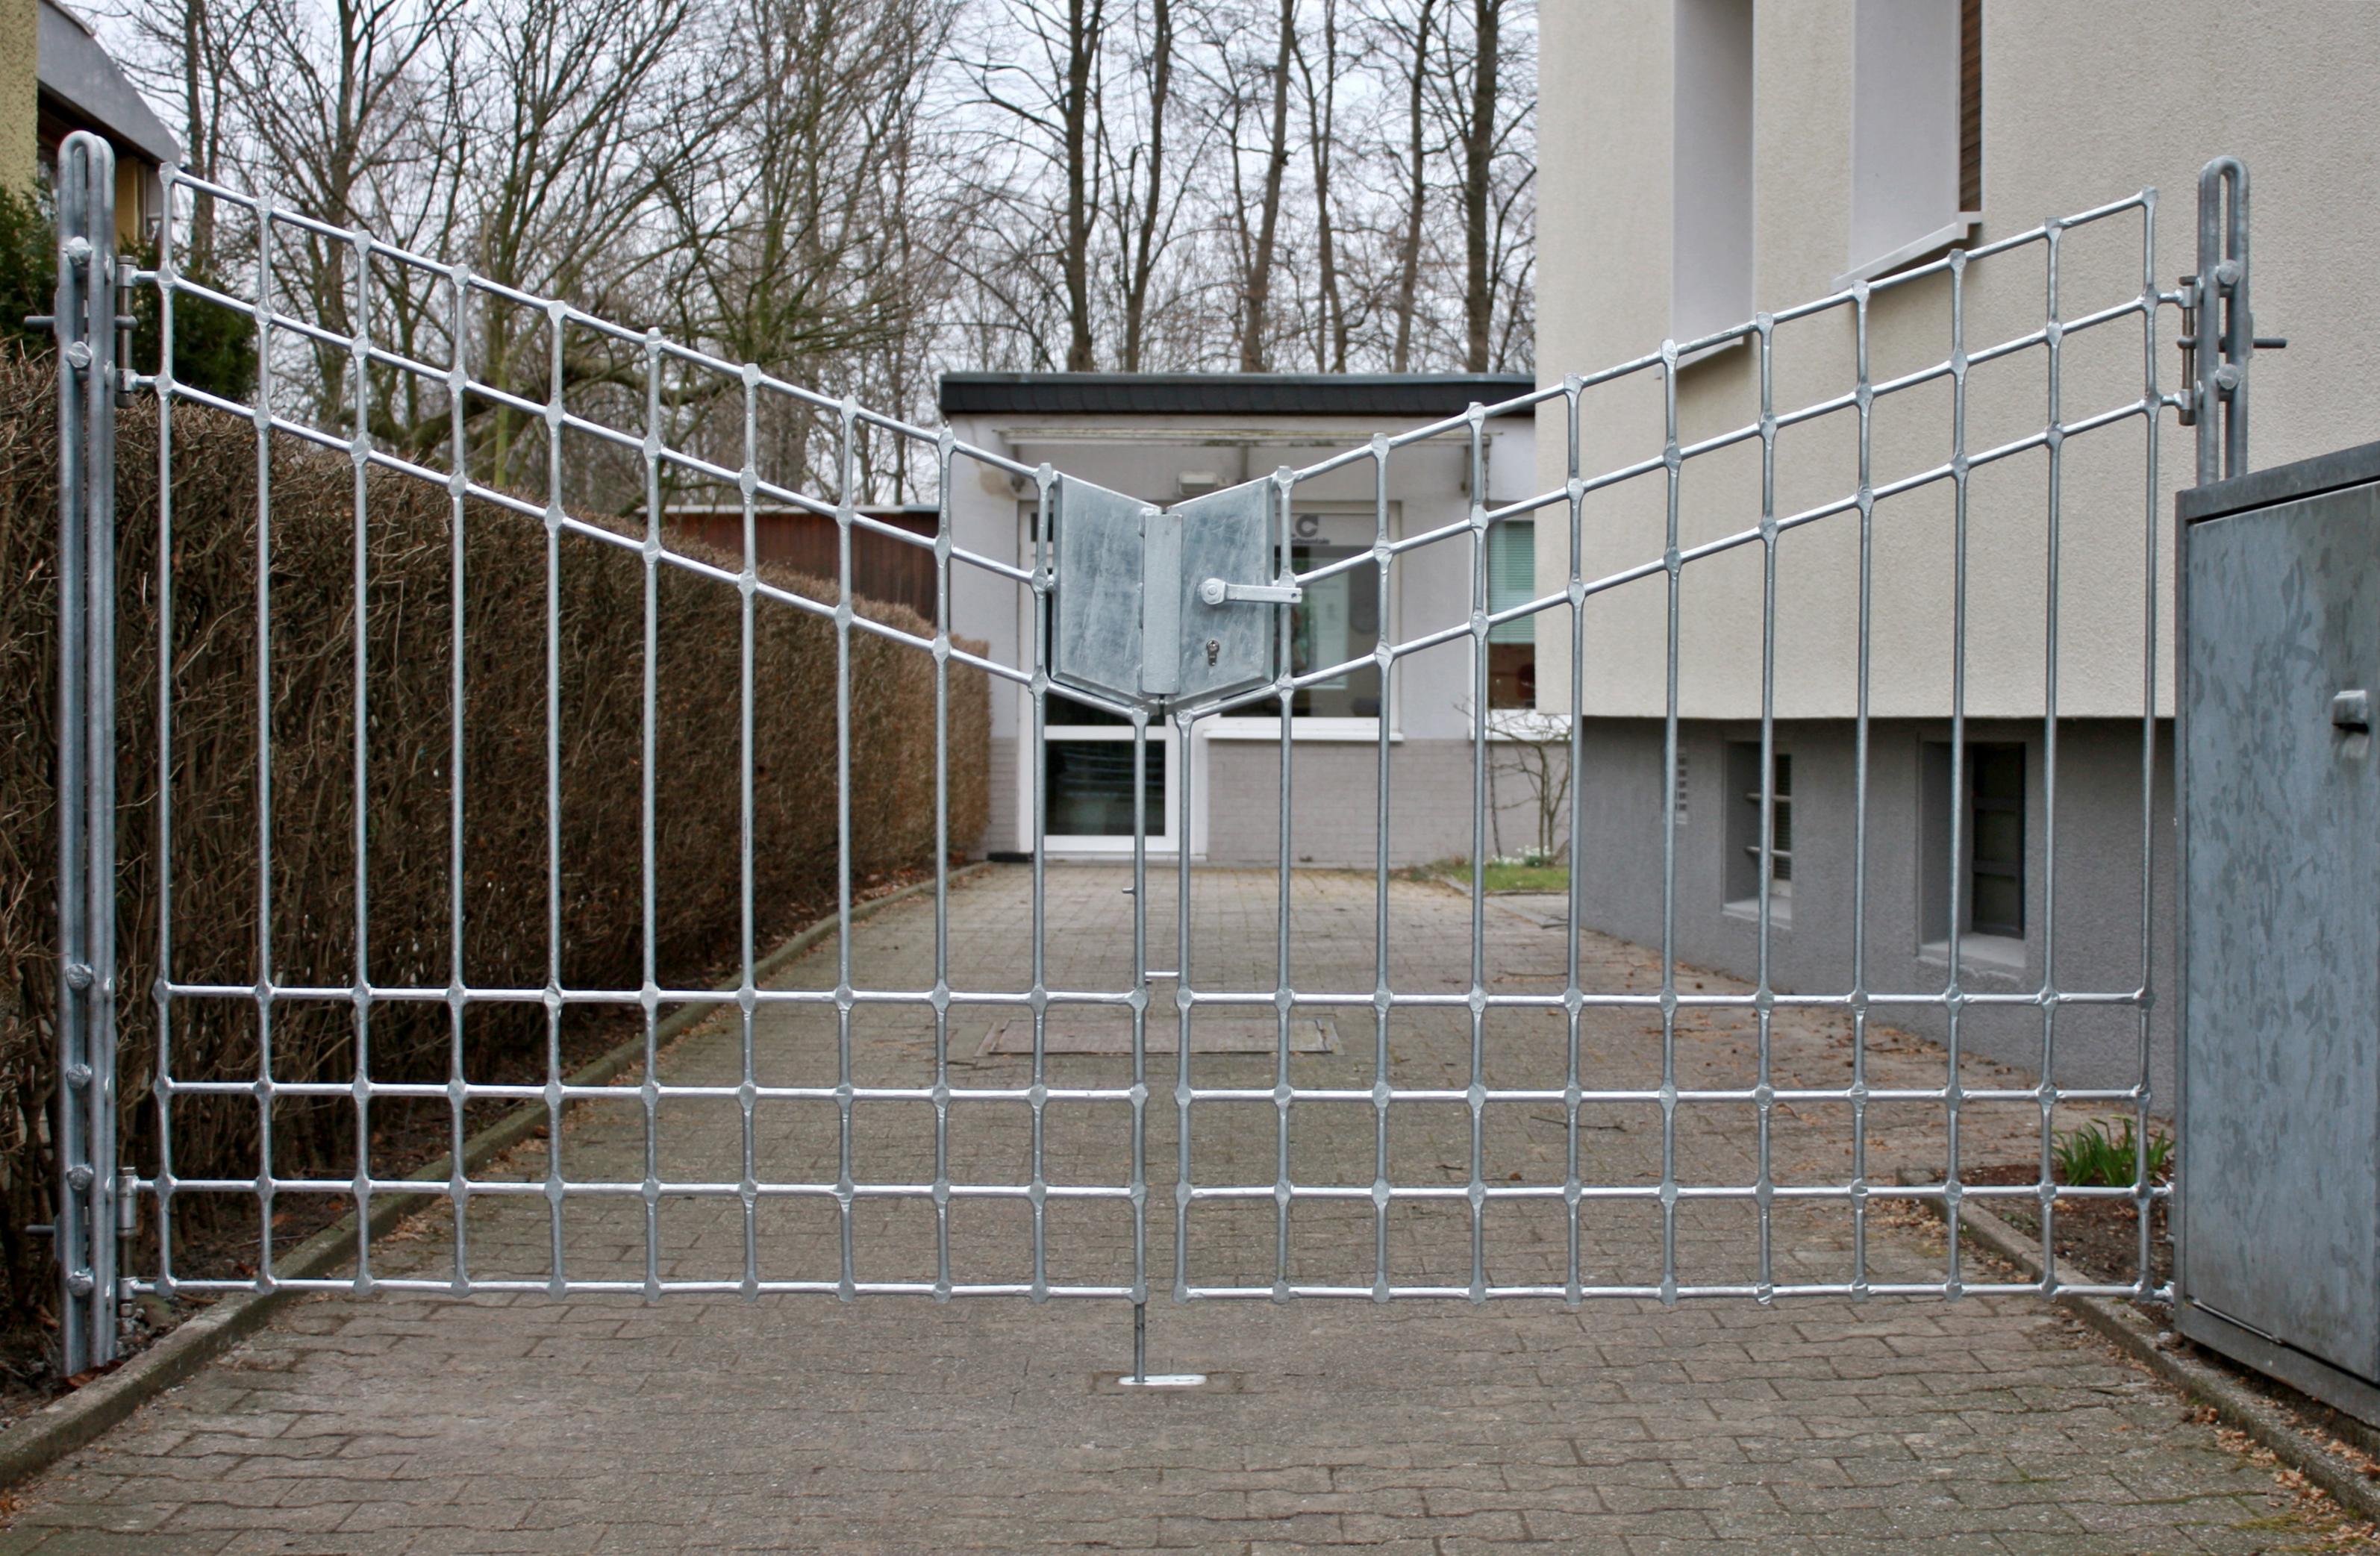 Einfahrtstor mit Netzstruktur